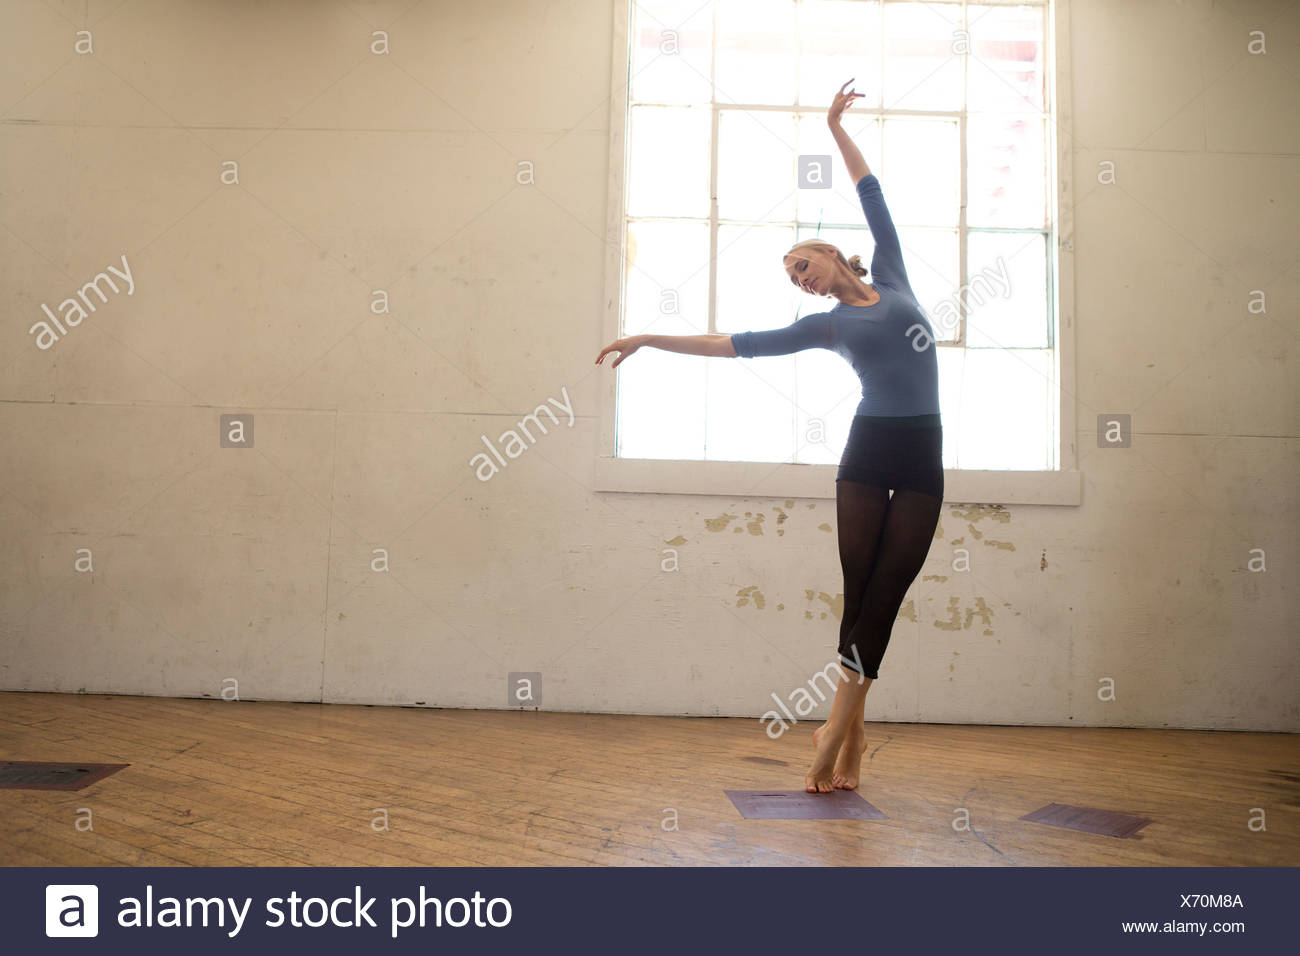 Weibliche Ballett-Tänzerin im studio Stockbild